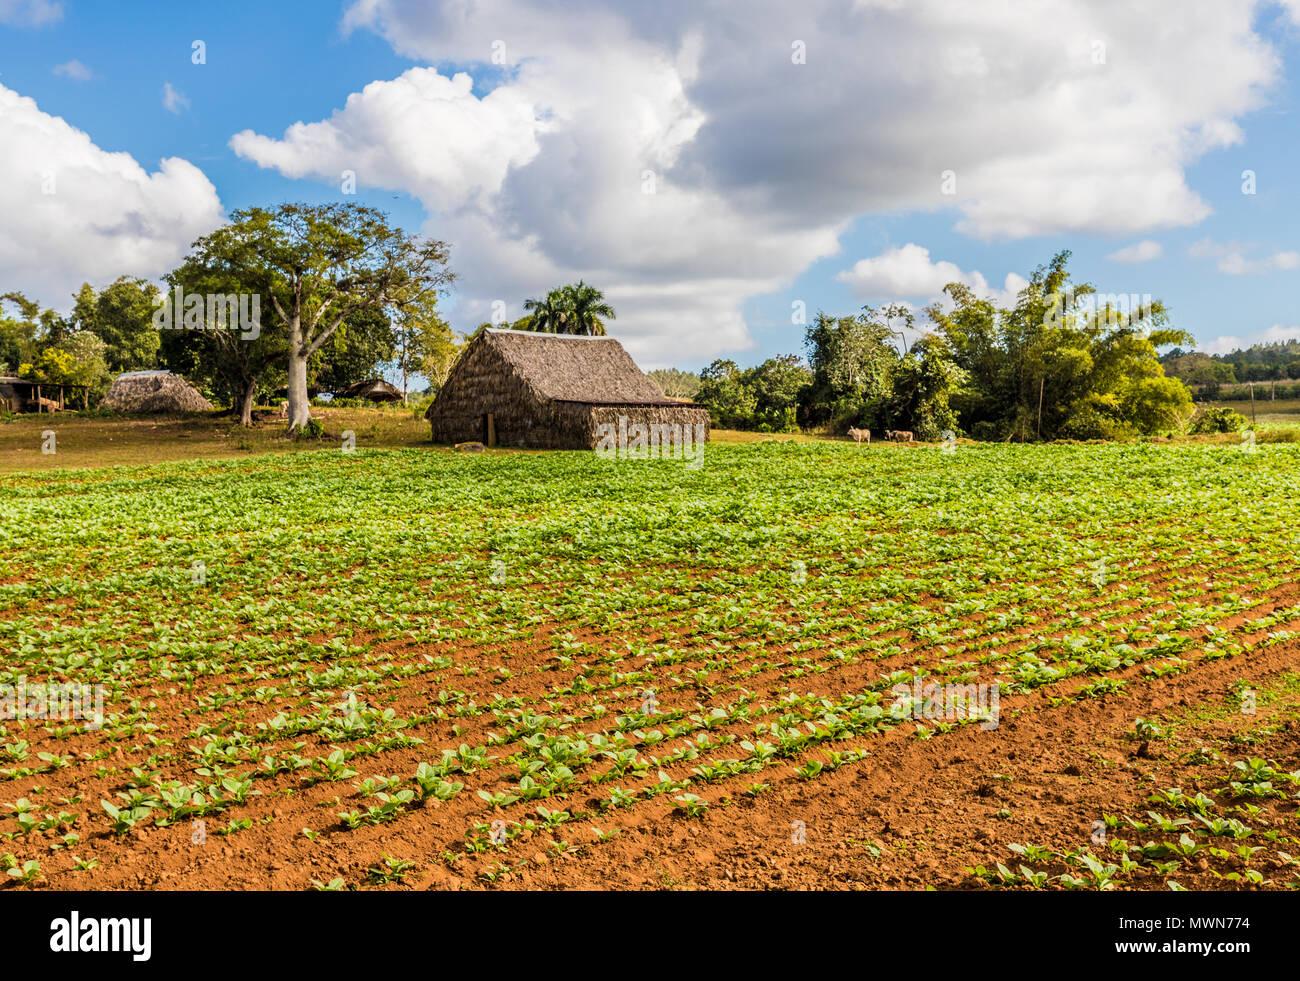 View of Vinales landscape in Cuba. - Stock Image